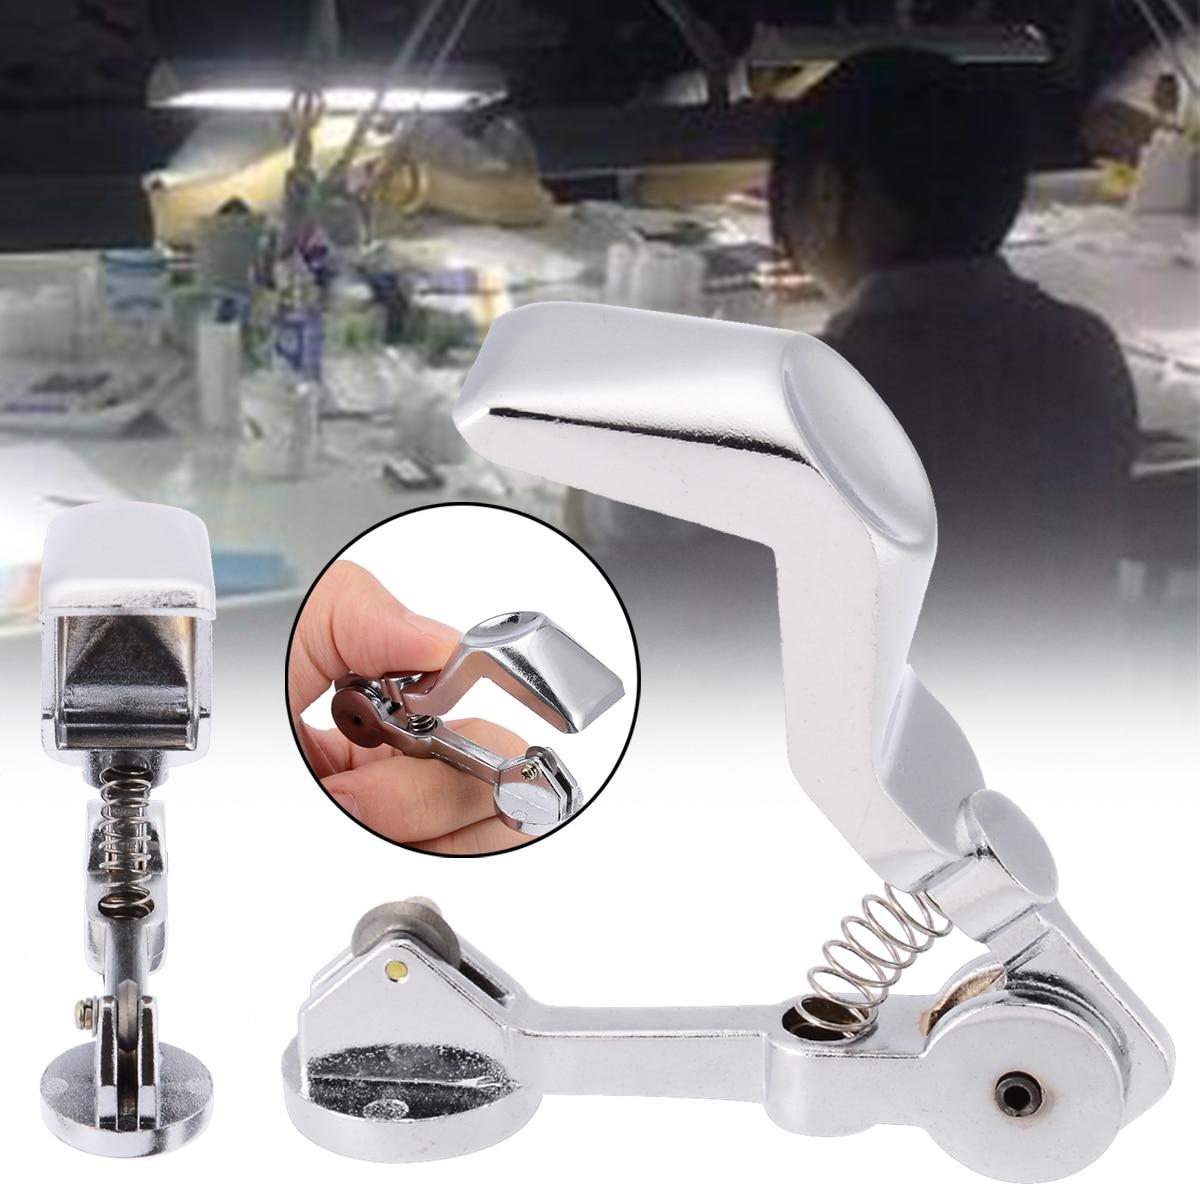 Glass Tubing Cutter Scientific DIY Circular Blade Cutter Plastic Pipe Cutting Tools Plastic Tube Pipe Cutter Hand Tools